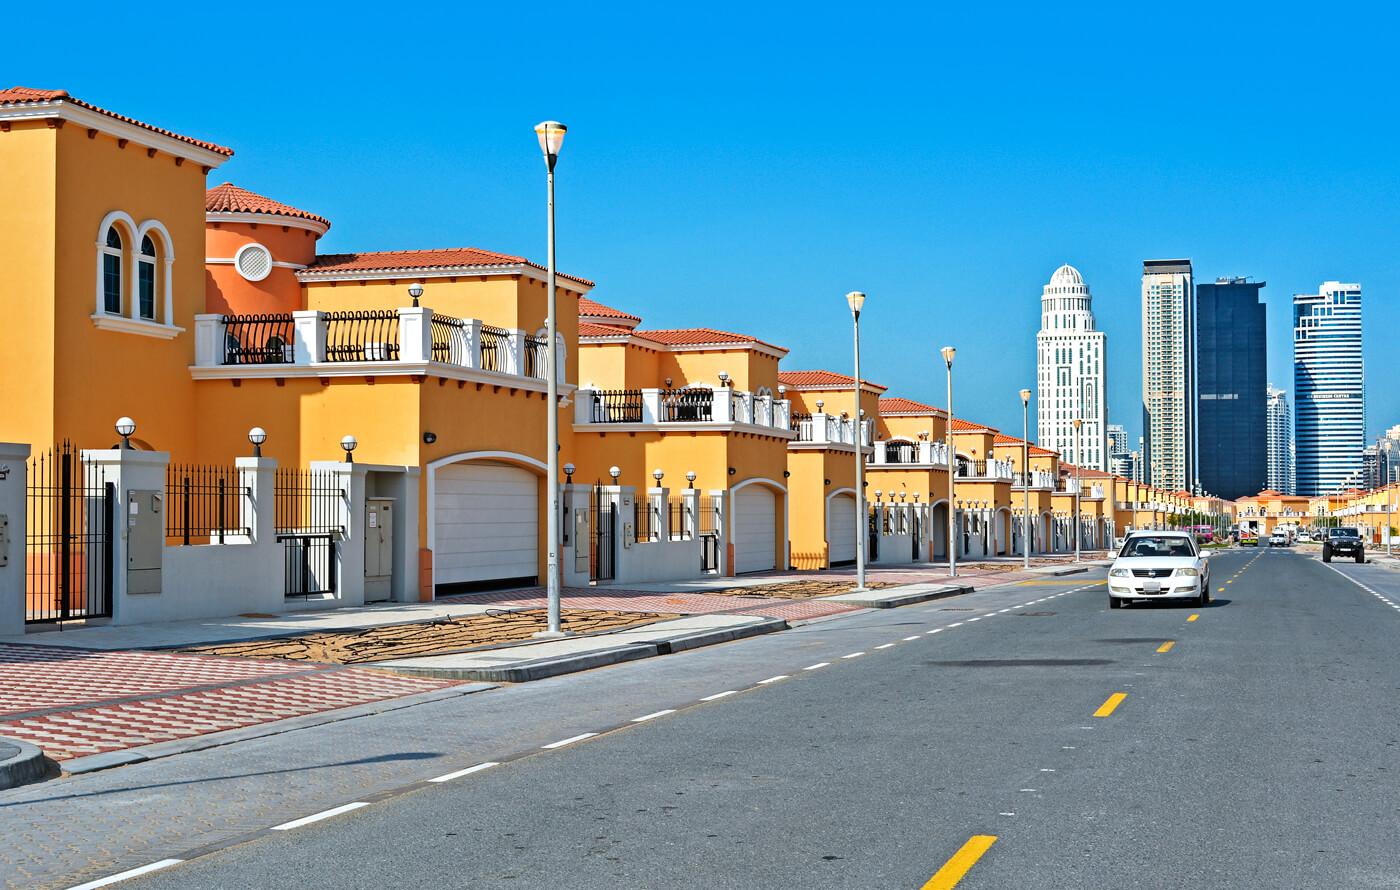 AC servicing in Jumeirah Park